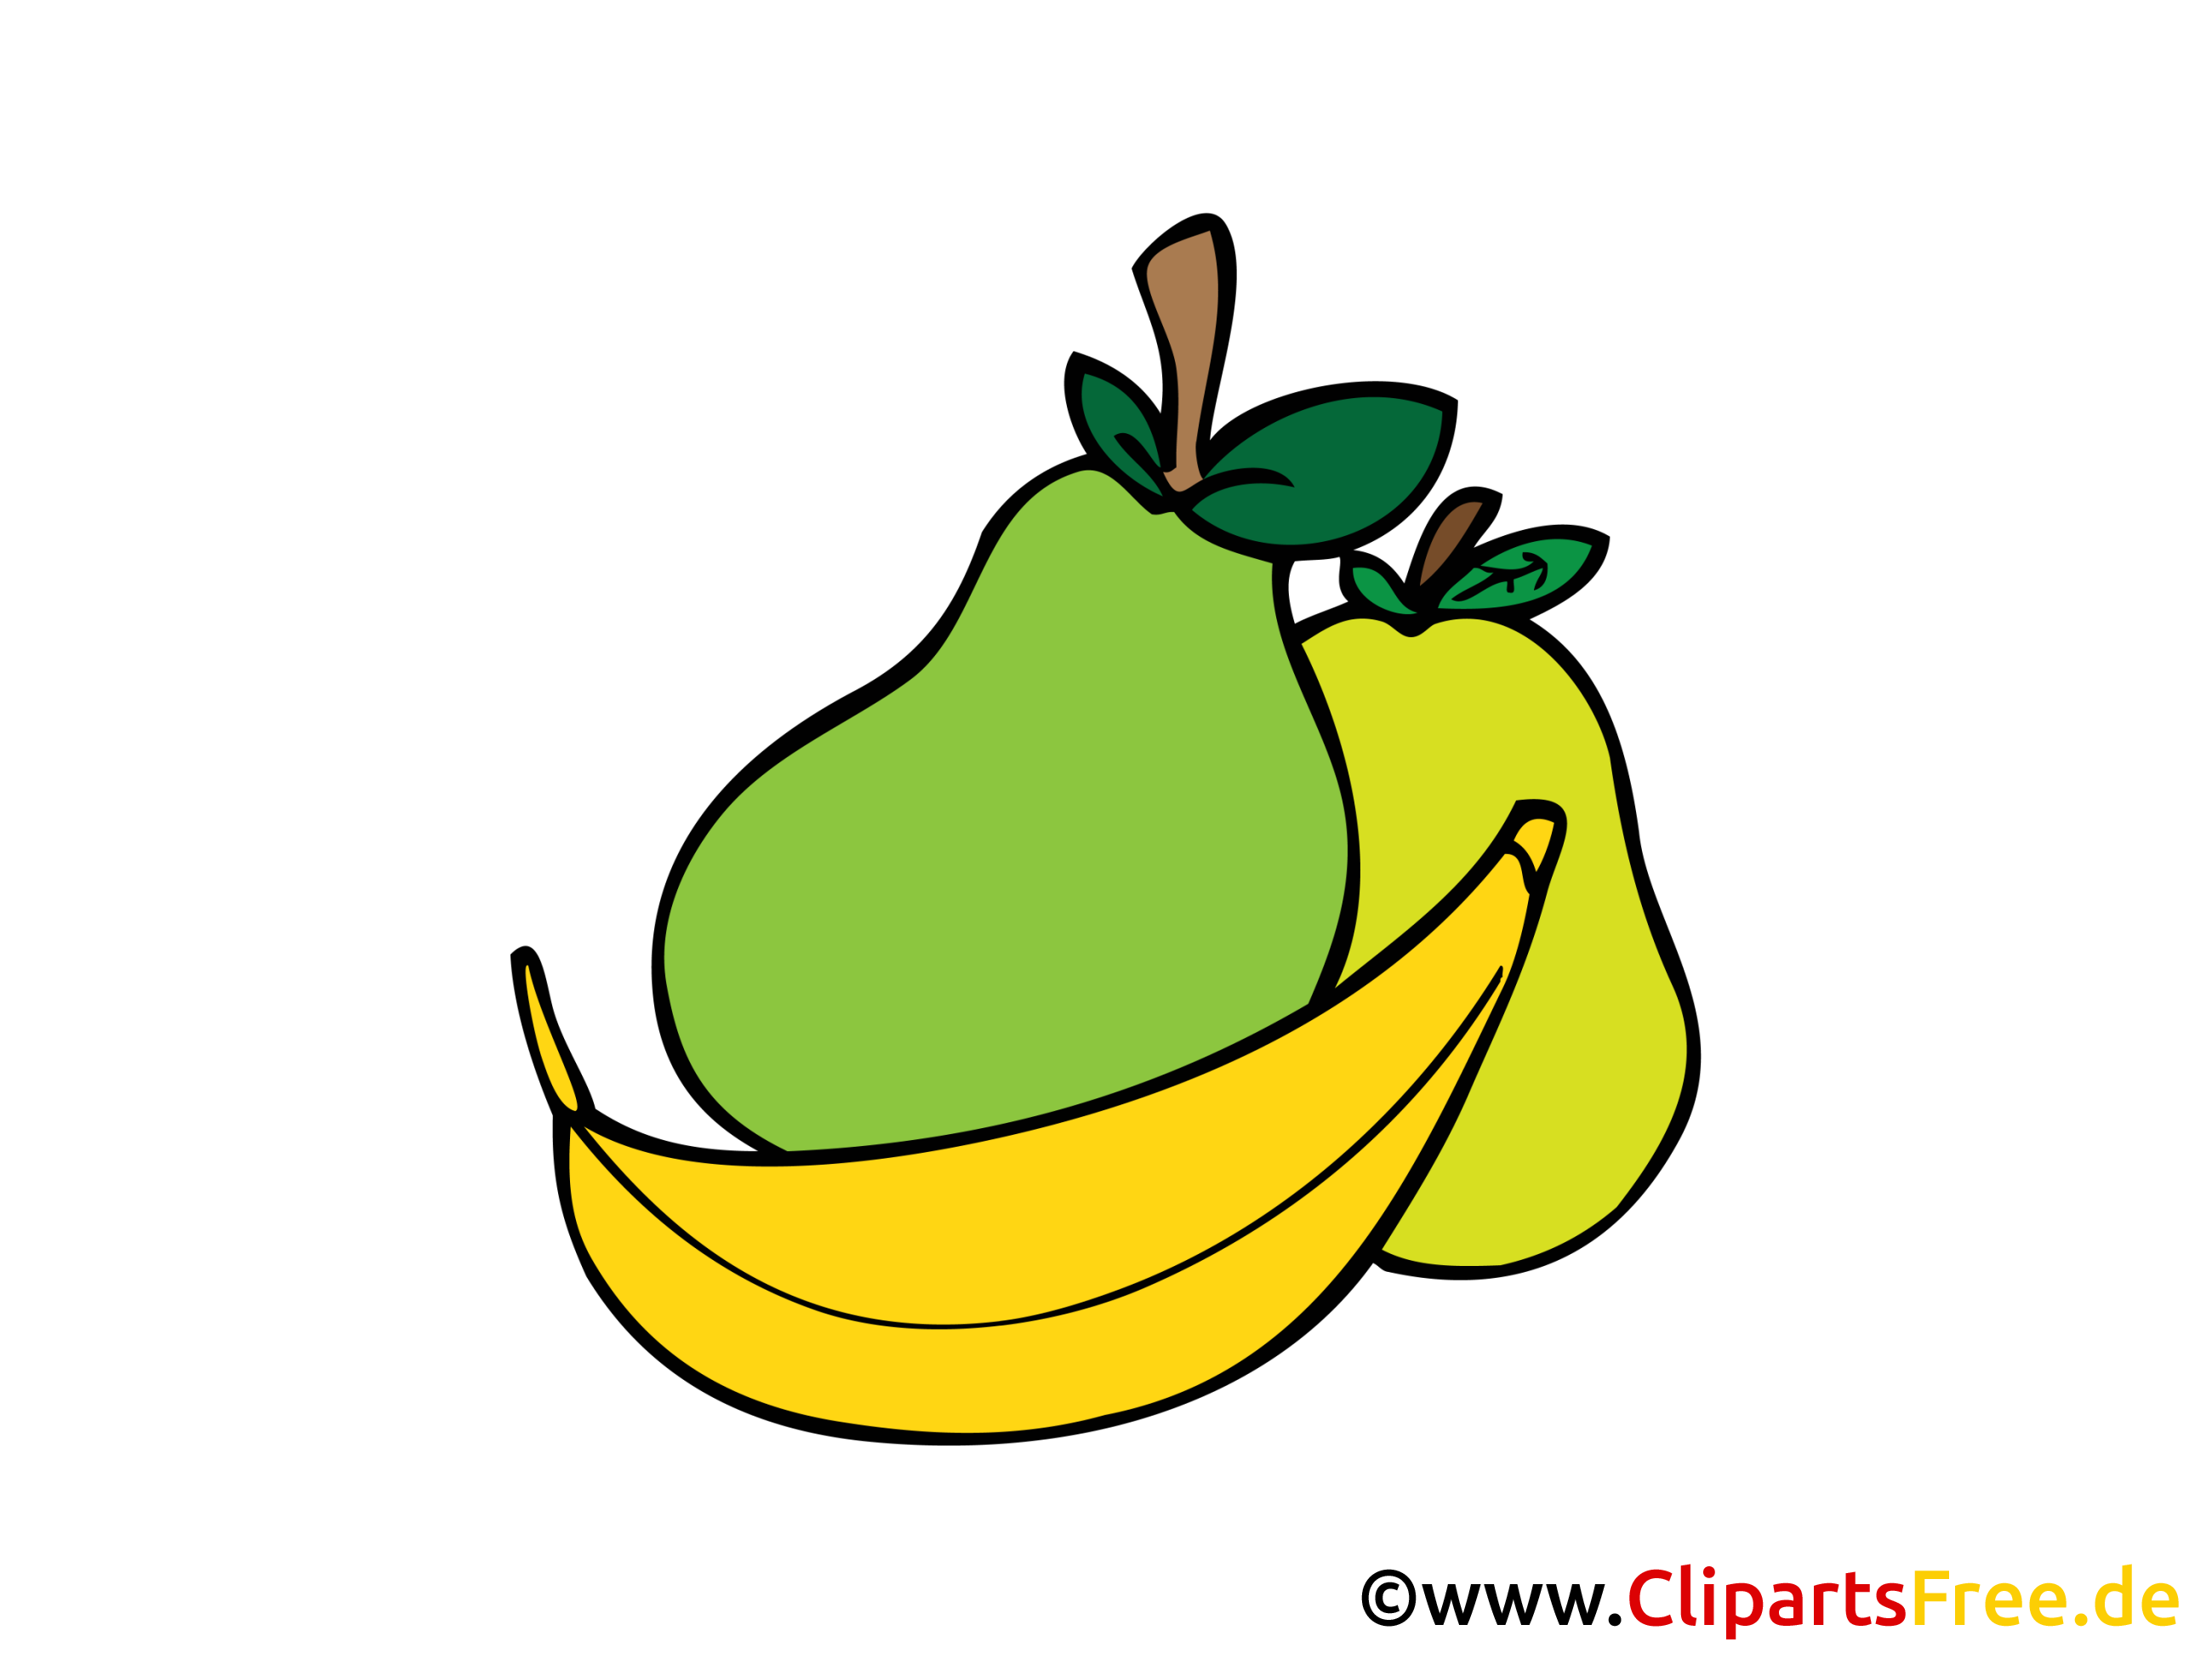 Obst Cliparts in Hochaufloesung